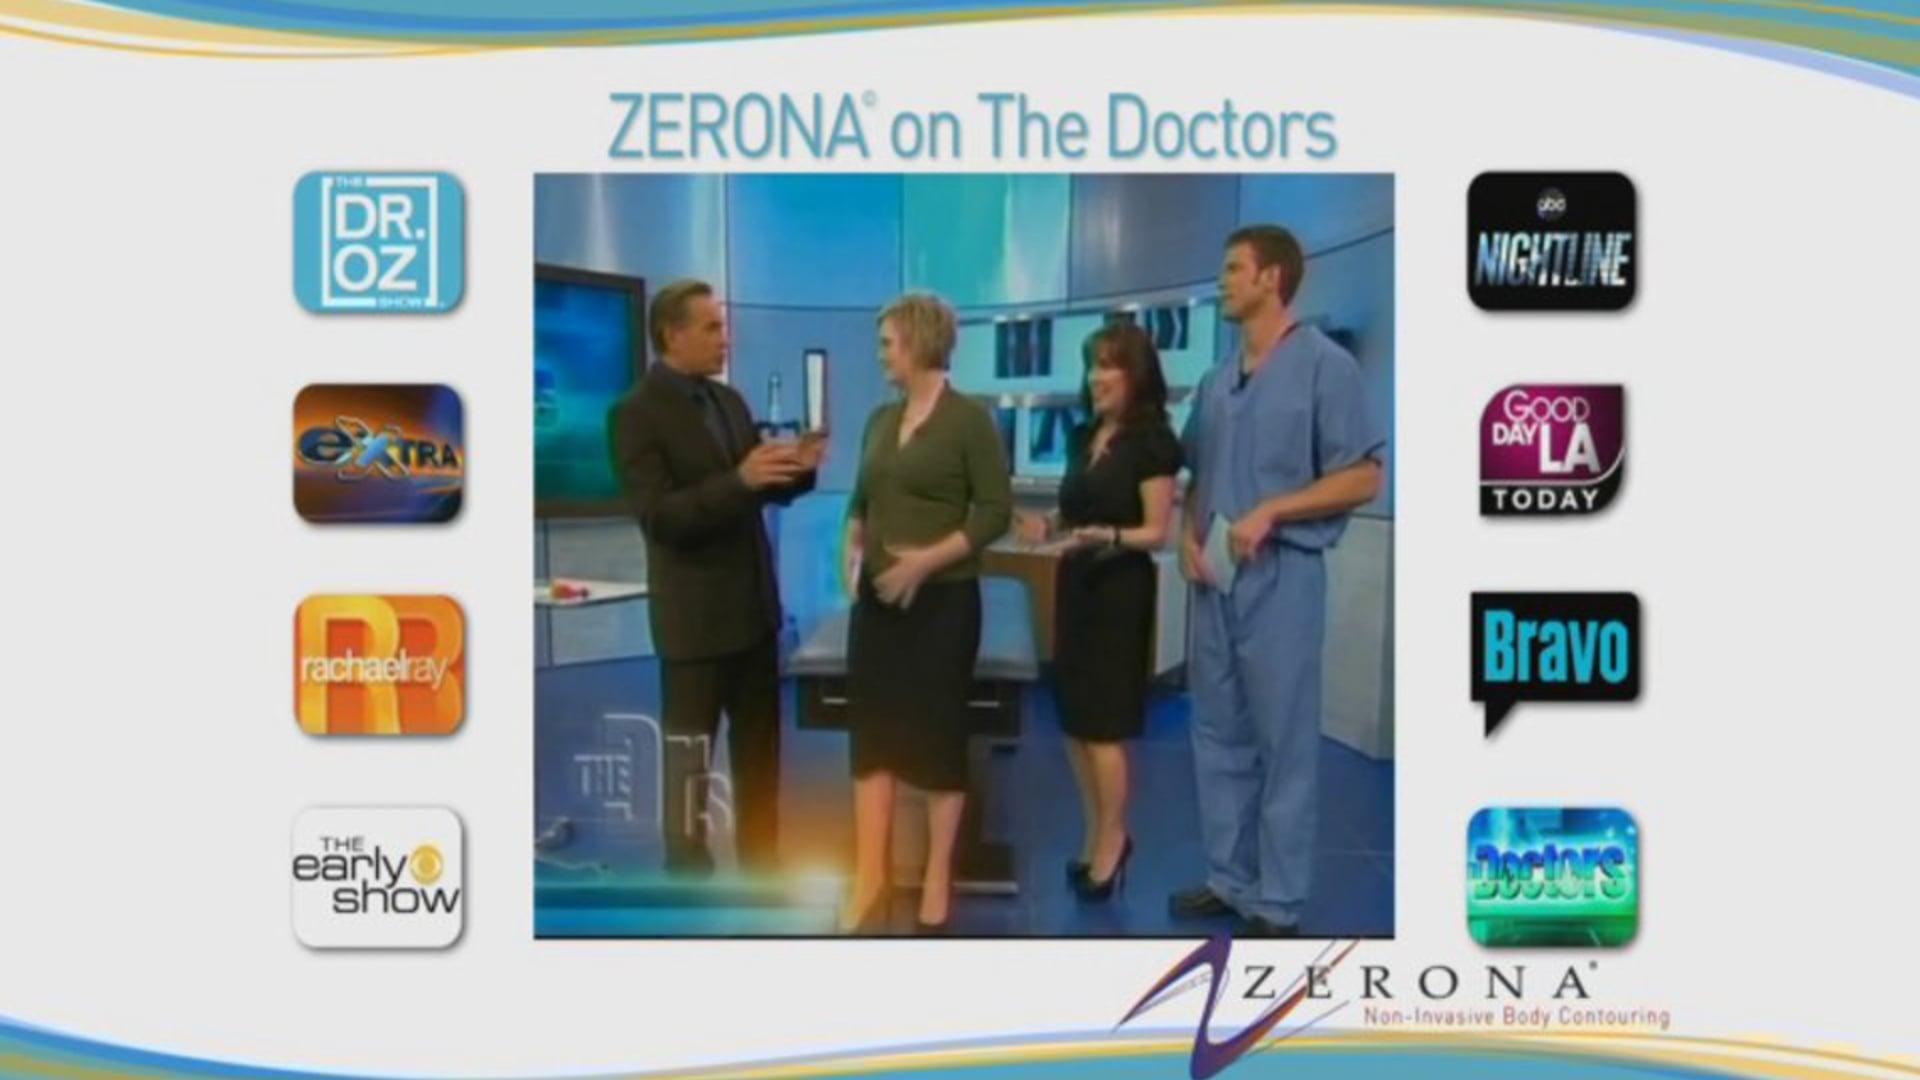 Zerona Overview